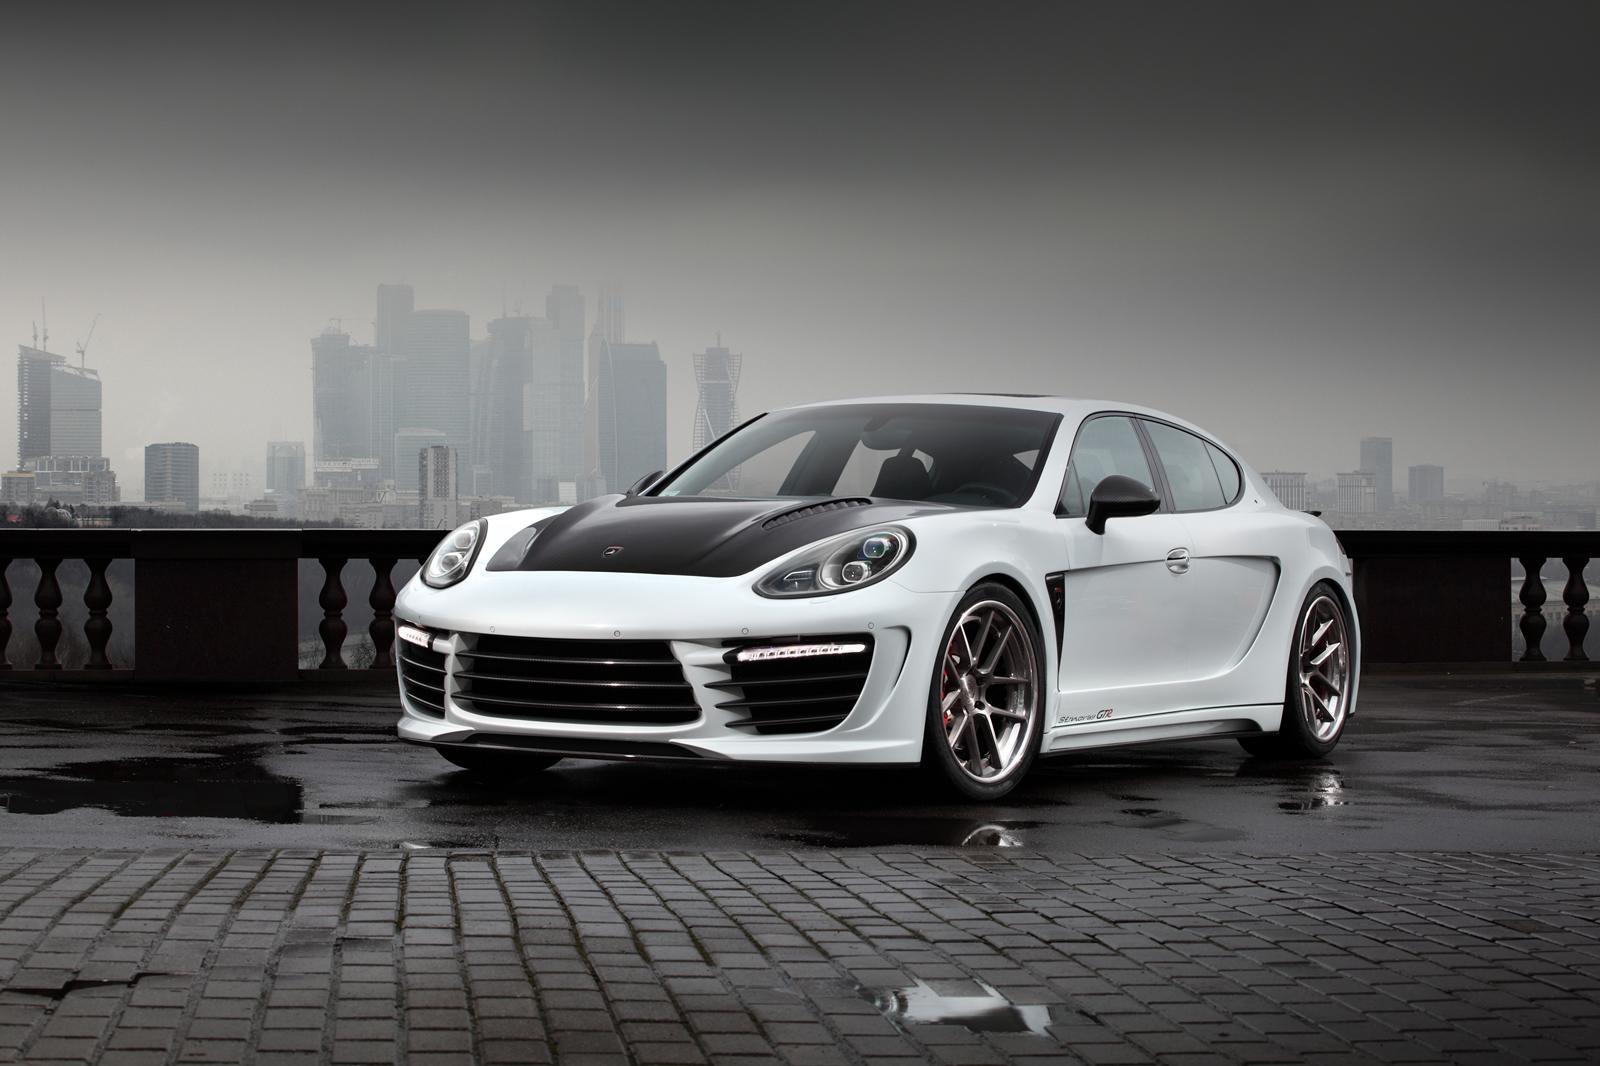 Porsche Tuning 2014 Porsche Panamera Stingray Gtr By Topcar